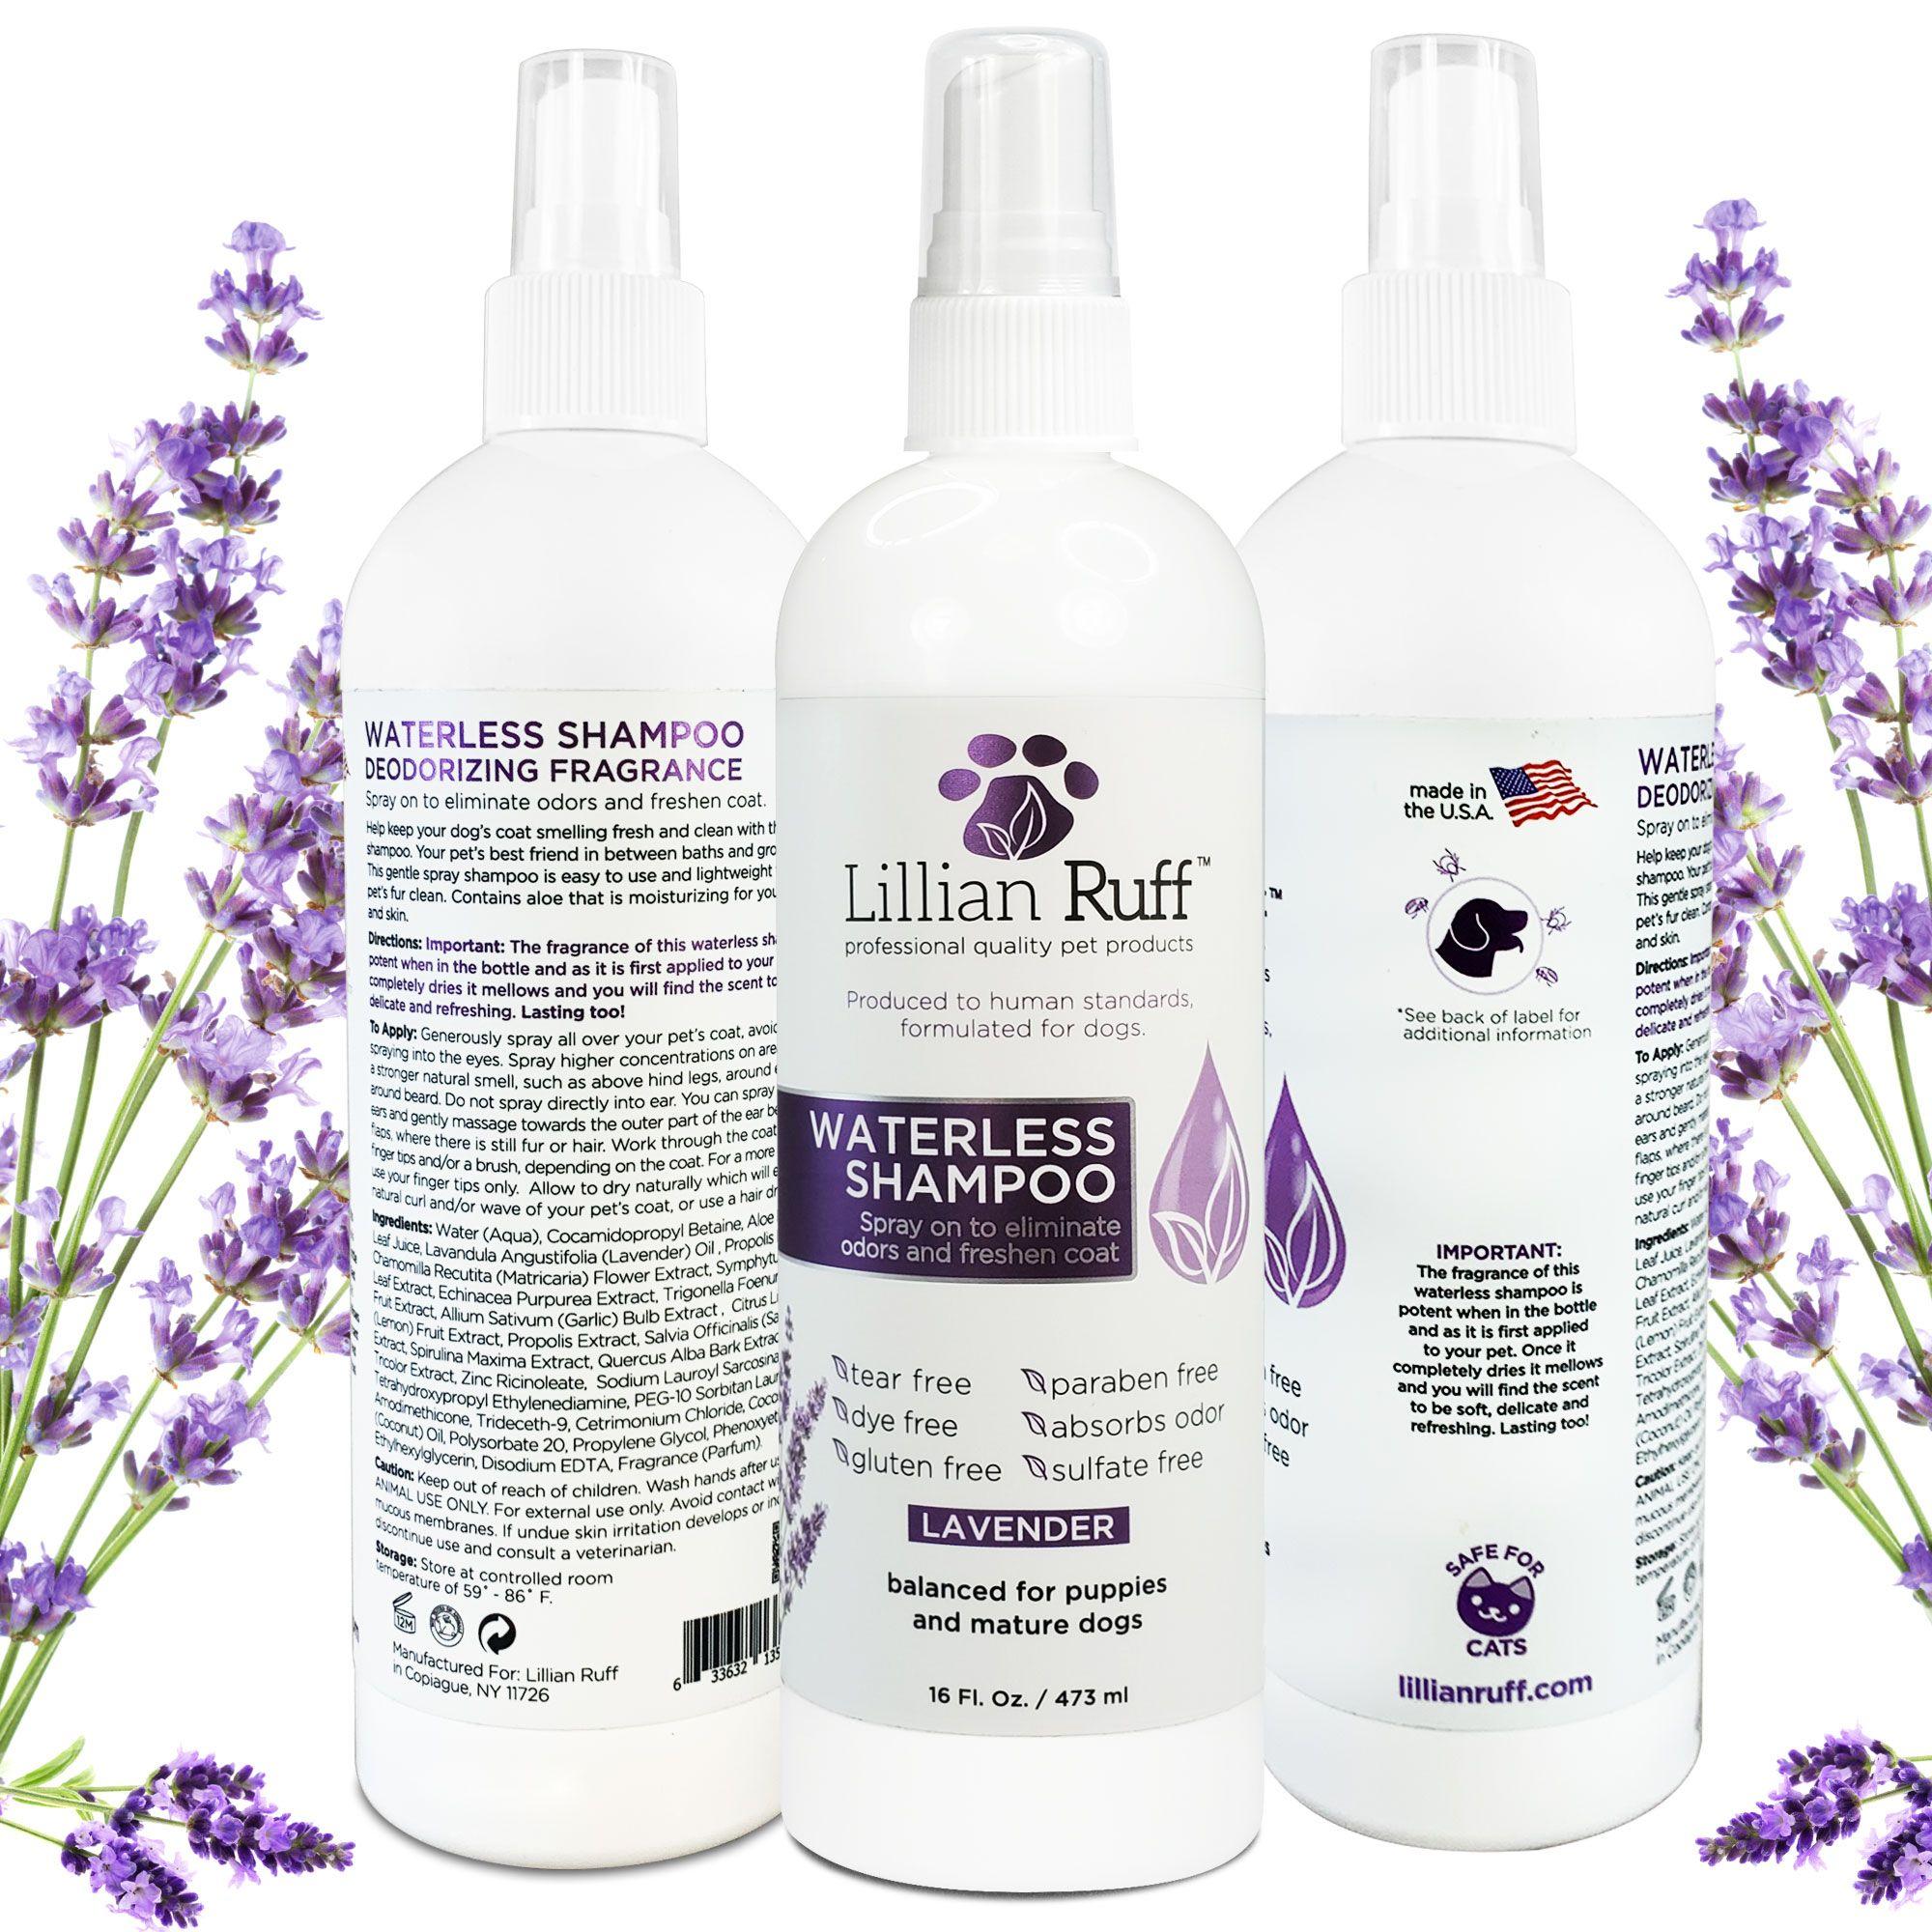 Lillian Ruff Waterless Shampoo Lavender Waterless Shampoo Deodorant Dog Shampoo